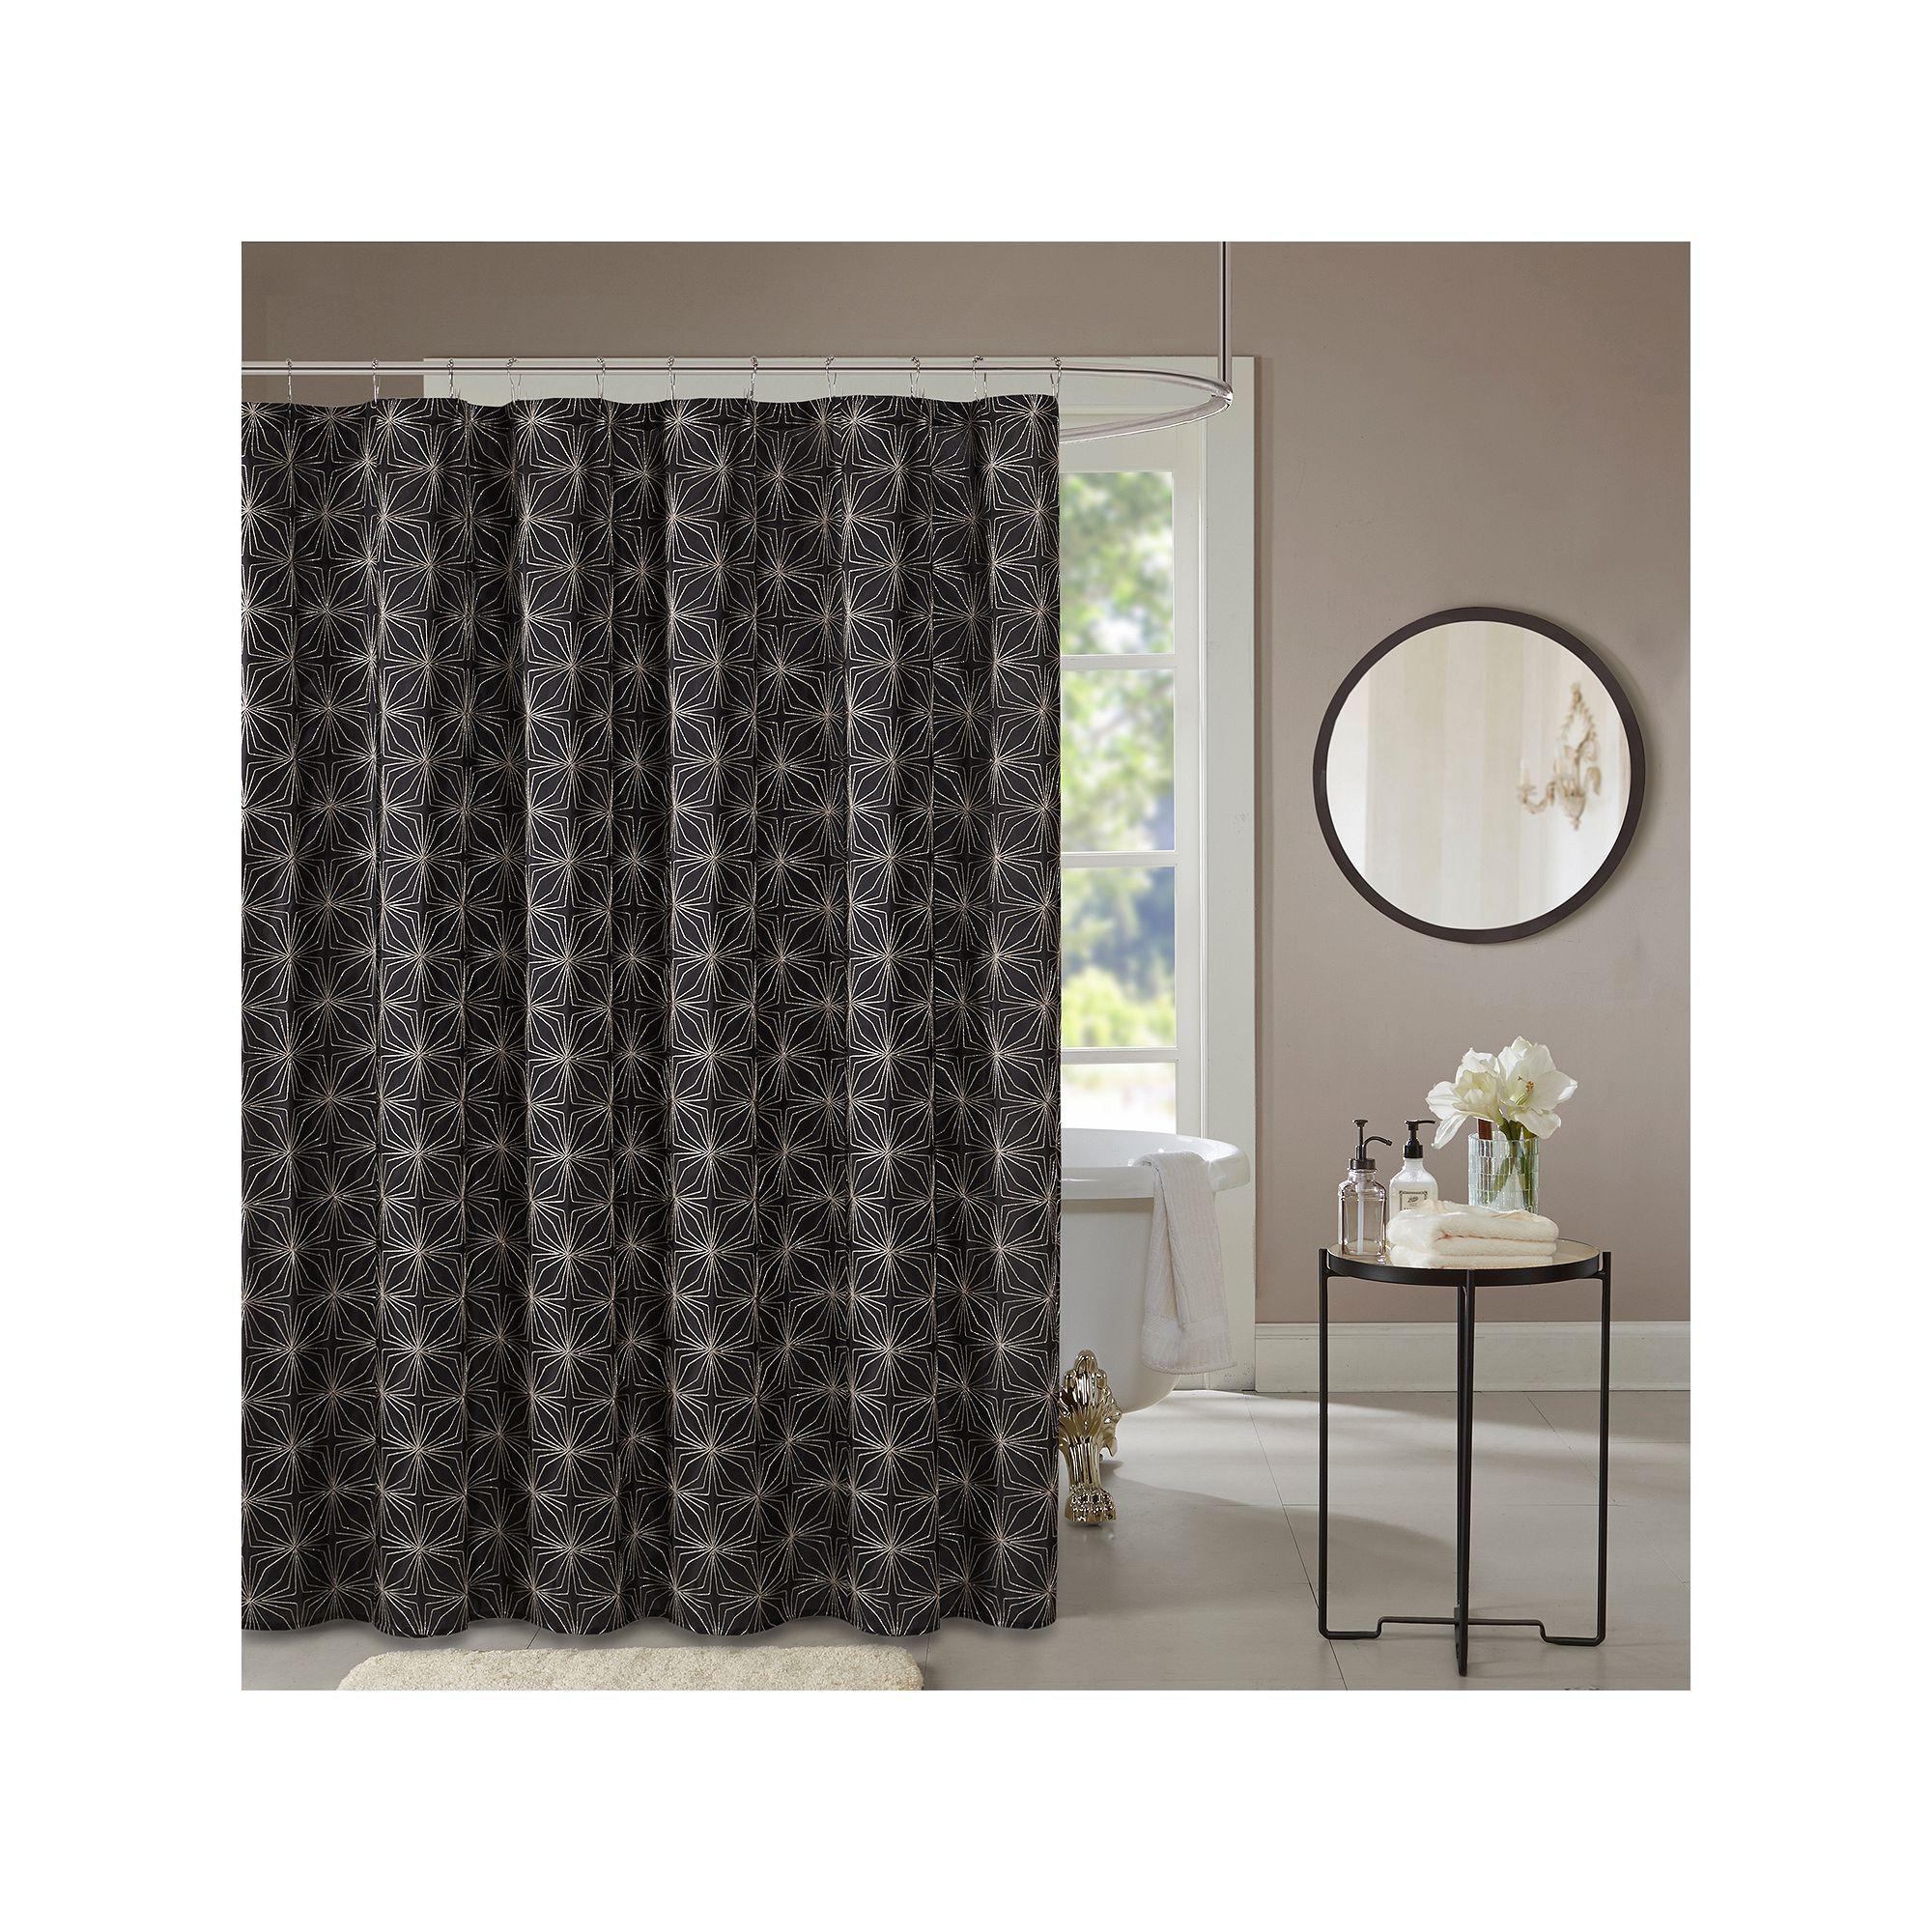 Madison Park Jordan Embroidered Shower Curtain Black Curtains